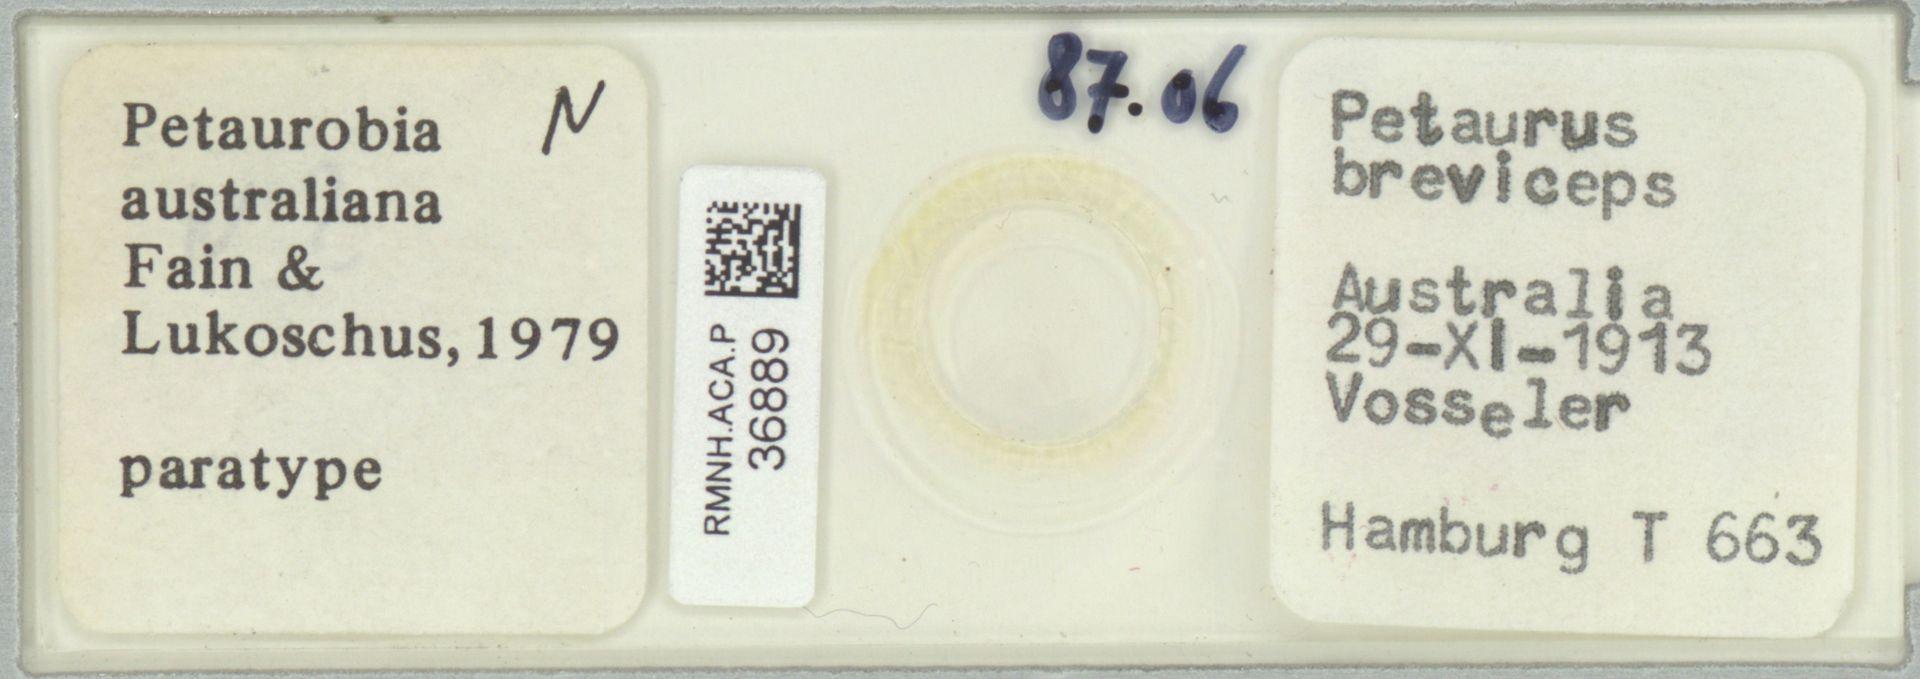 RMNH.ACA.P.36889   Petaurobia australiana Fain & Lukoschus, 1979